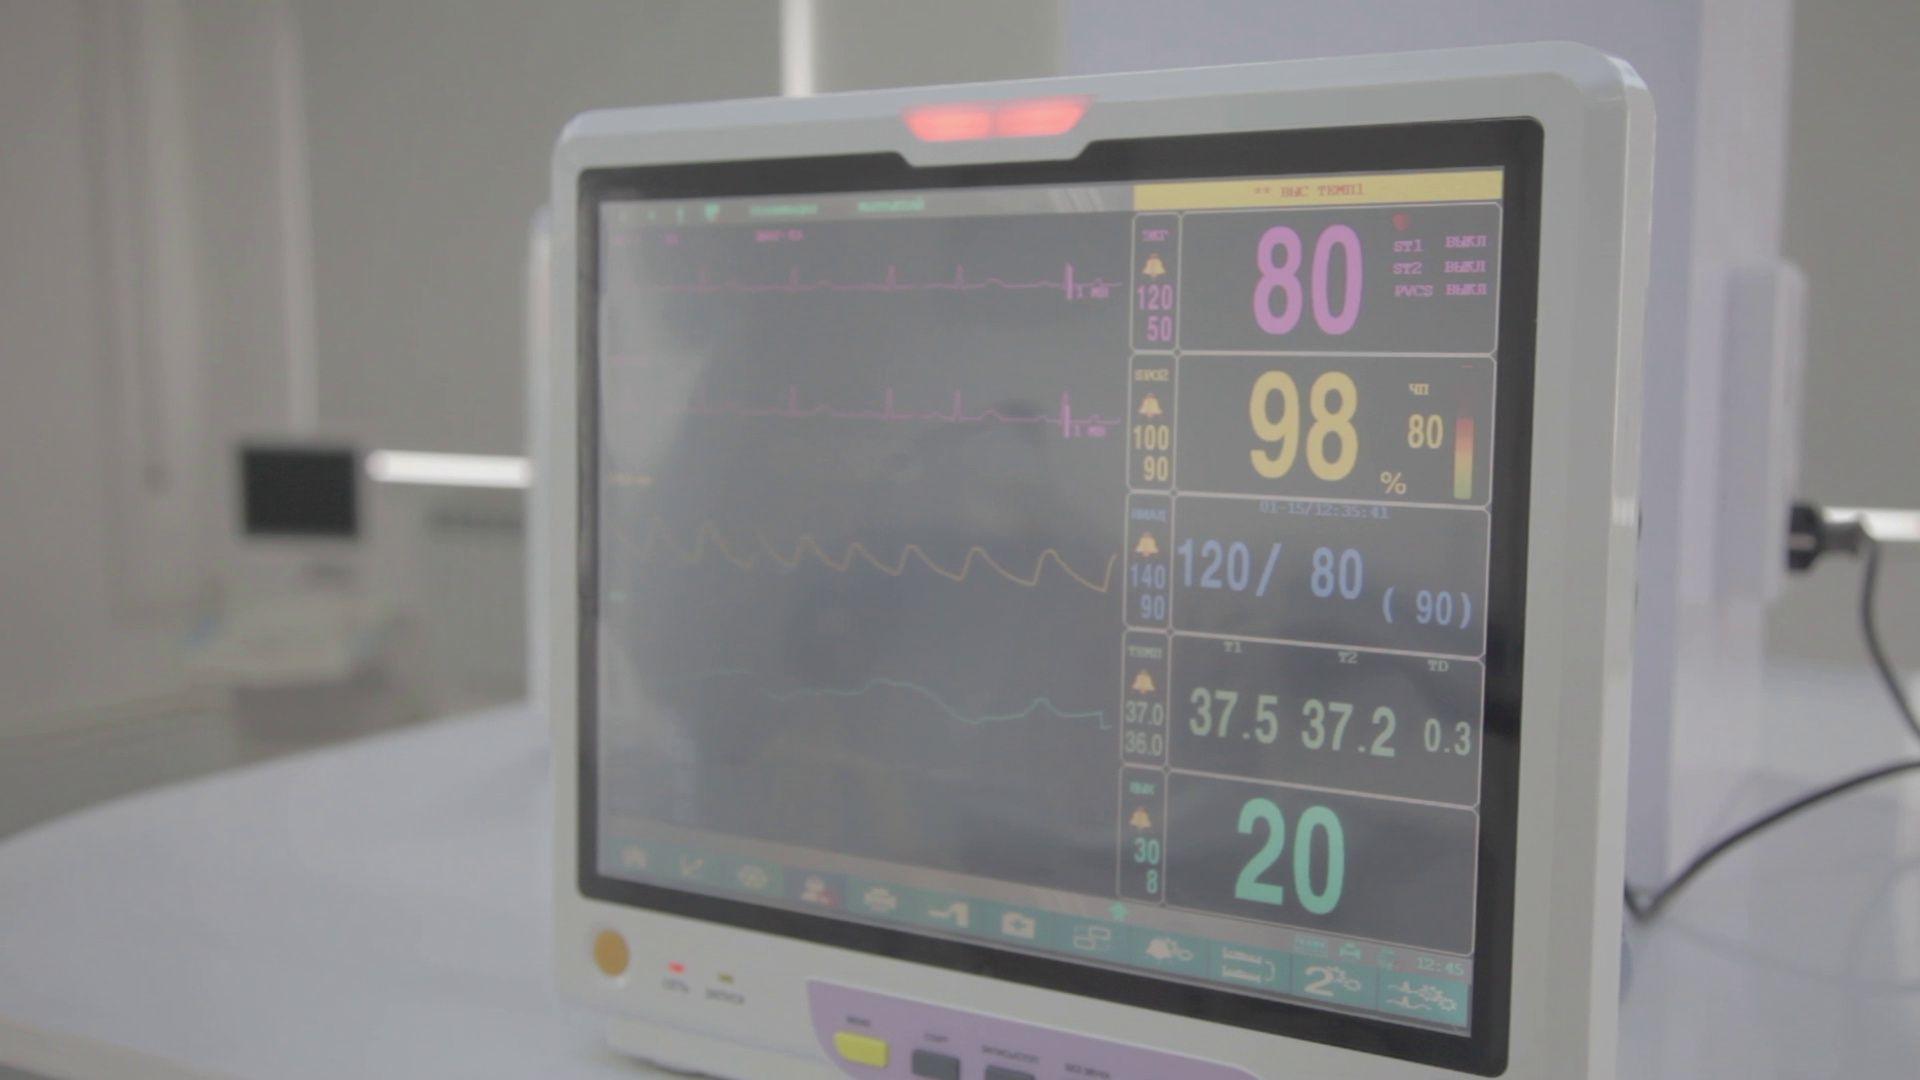 Medical equipment. Ultrasound machine in a modern